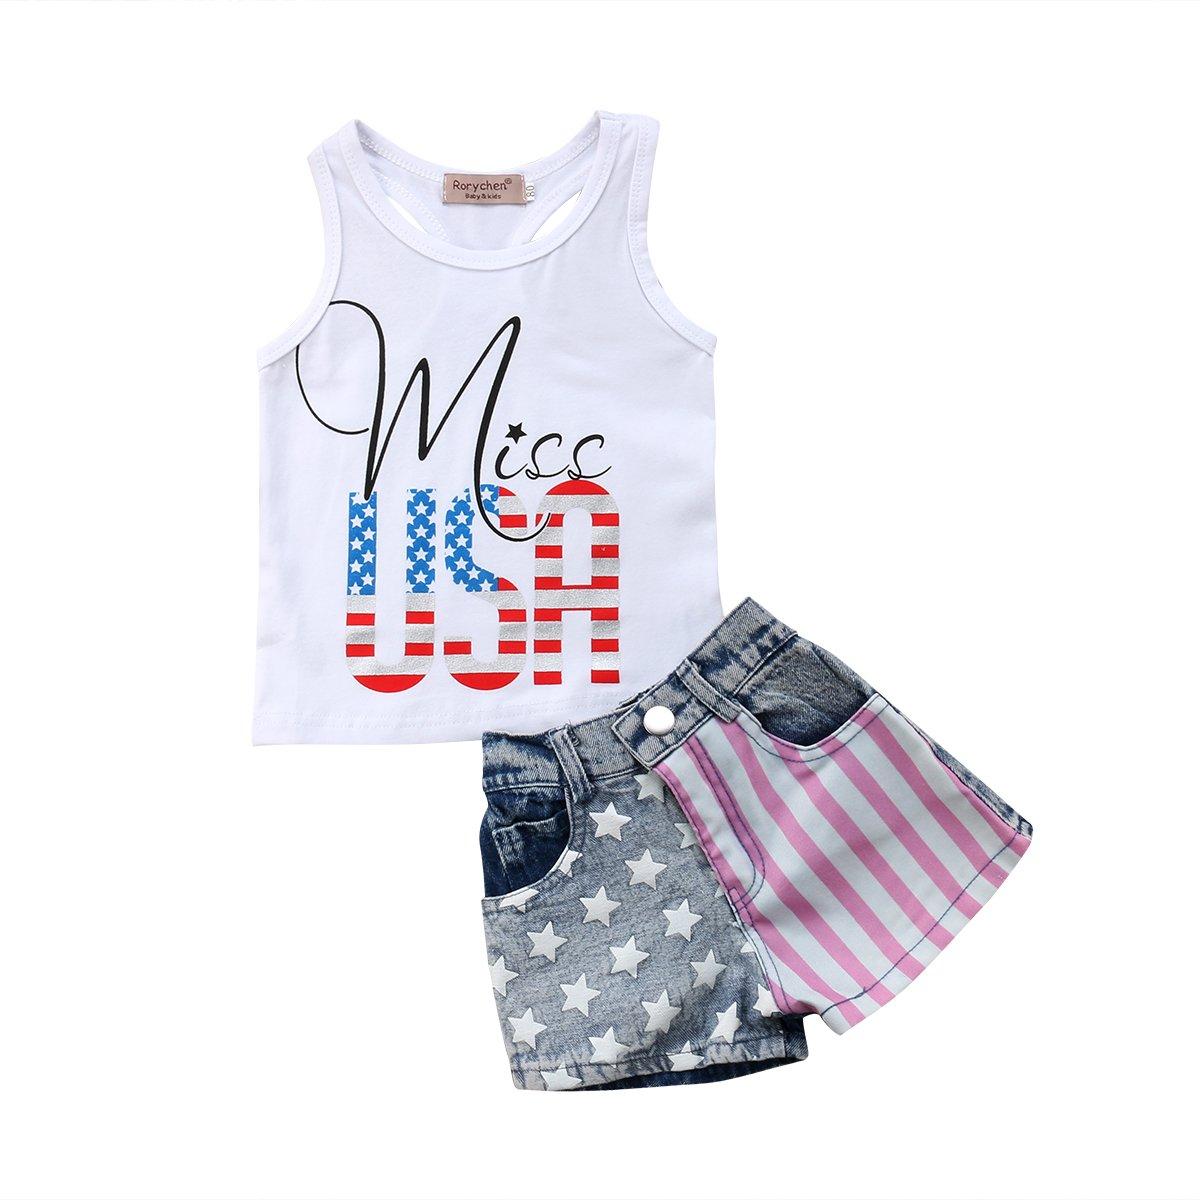 Infant Baby Girl 4th of July Clothes Outfits Set,Newborn Tassel Vest +Denim Shorts Pants (2-3T, Blue)